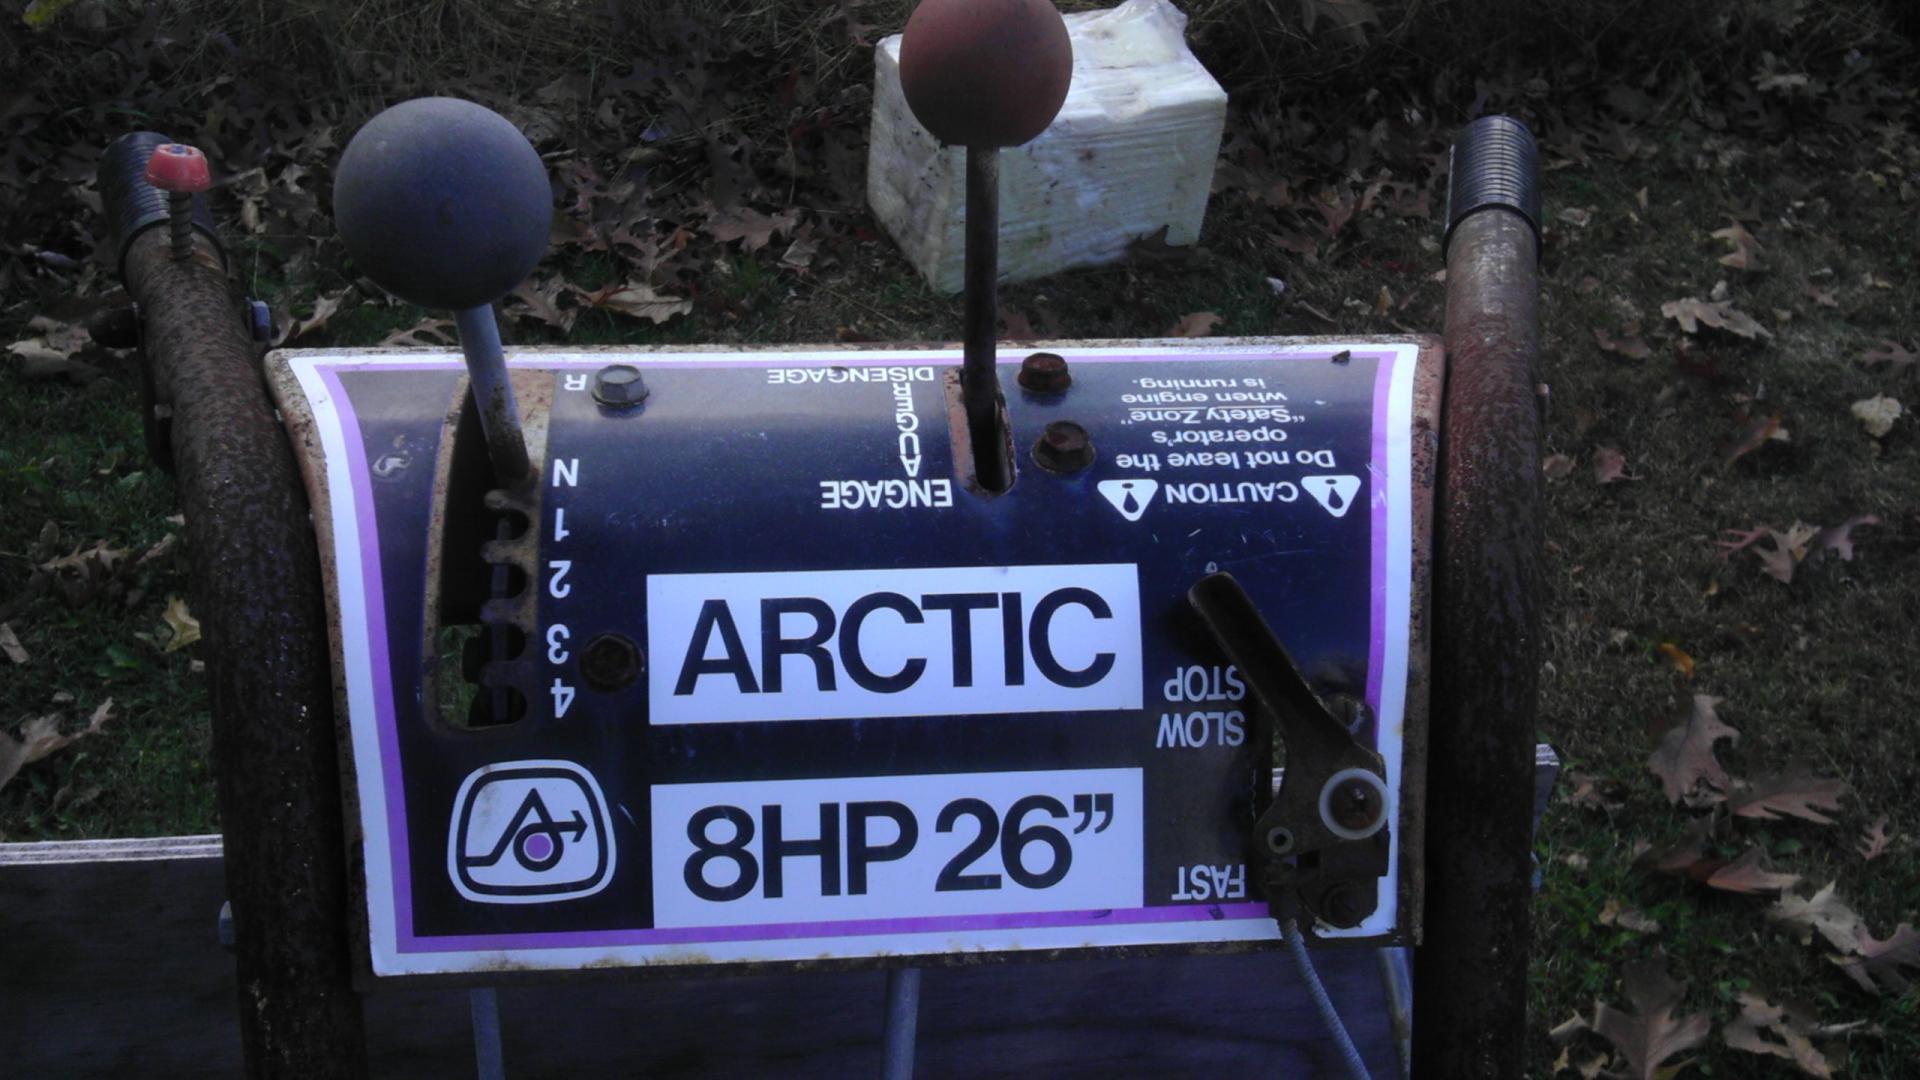 Arctic snowblower 8hp 26 inch cut-imag0874.jpg